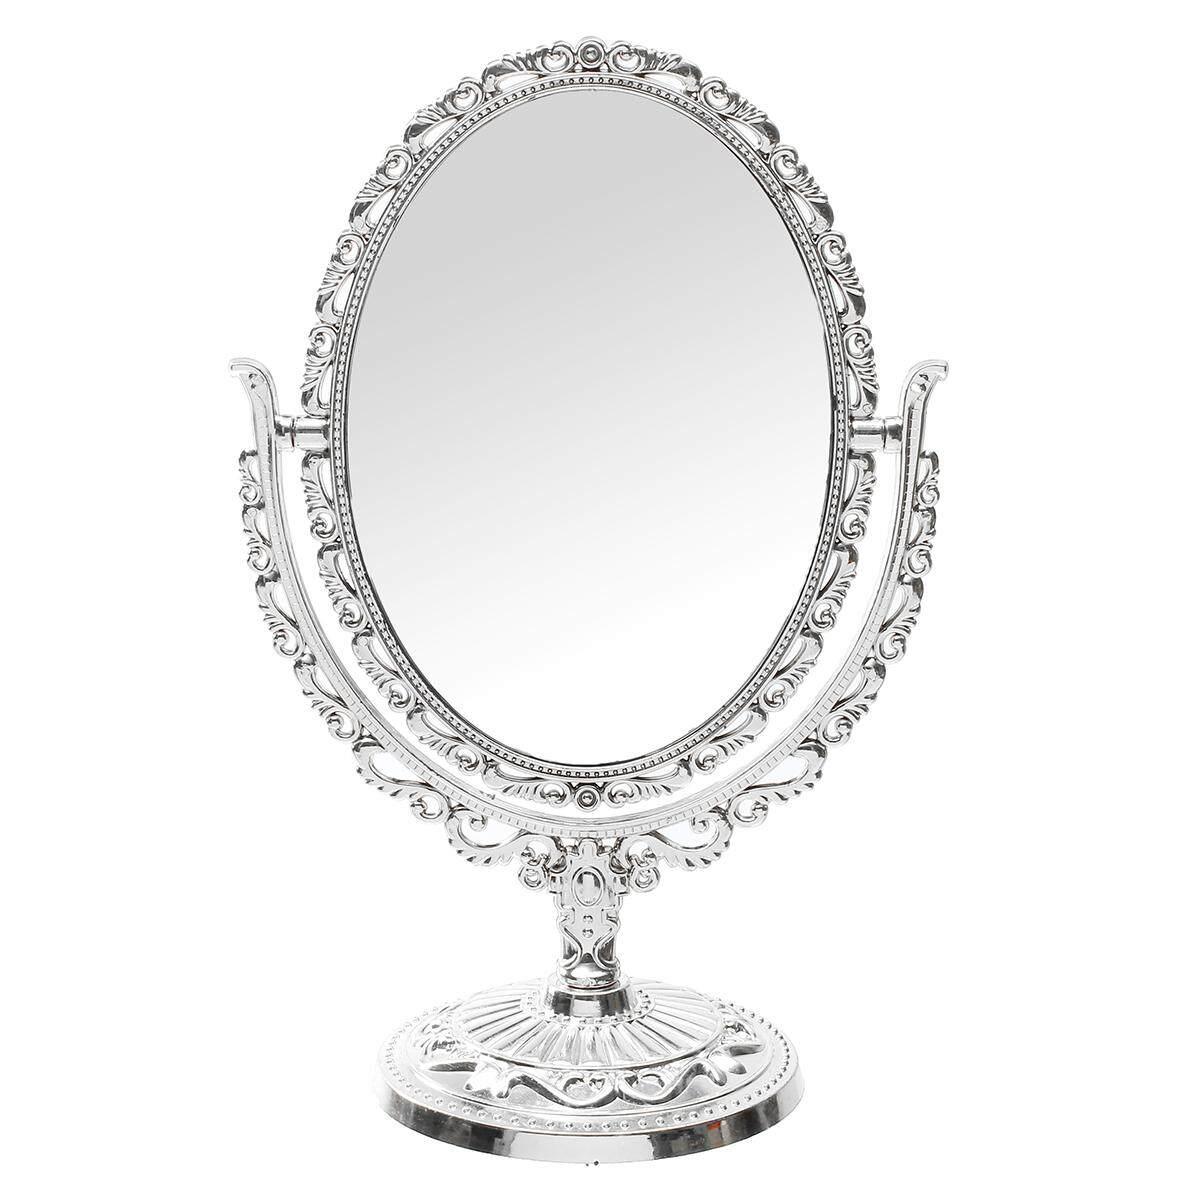 Vanity Mirror Oval shape 31cm silver vintage handheld Table Top MakeUp mirror(Silver) - intl